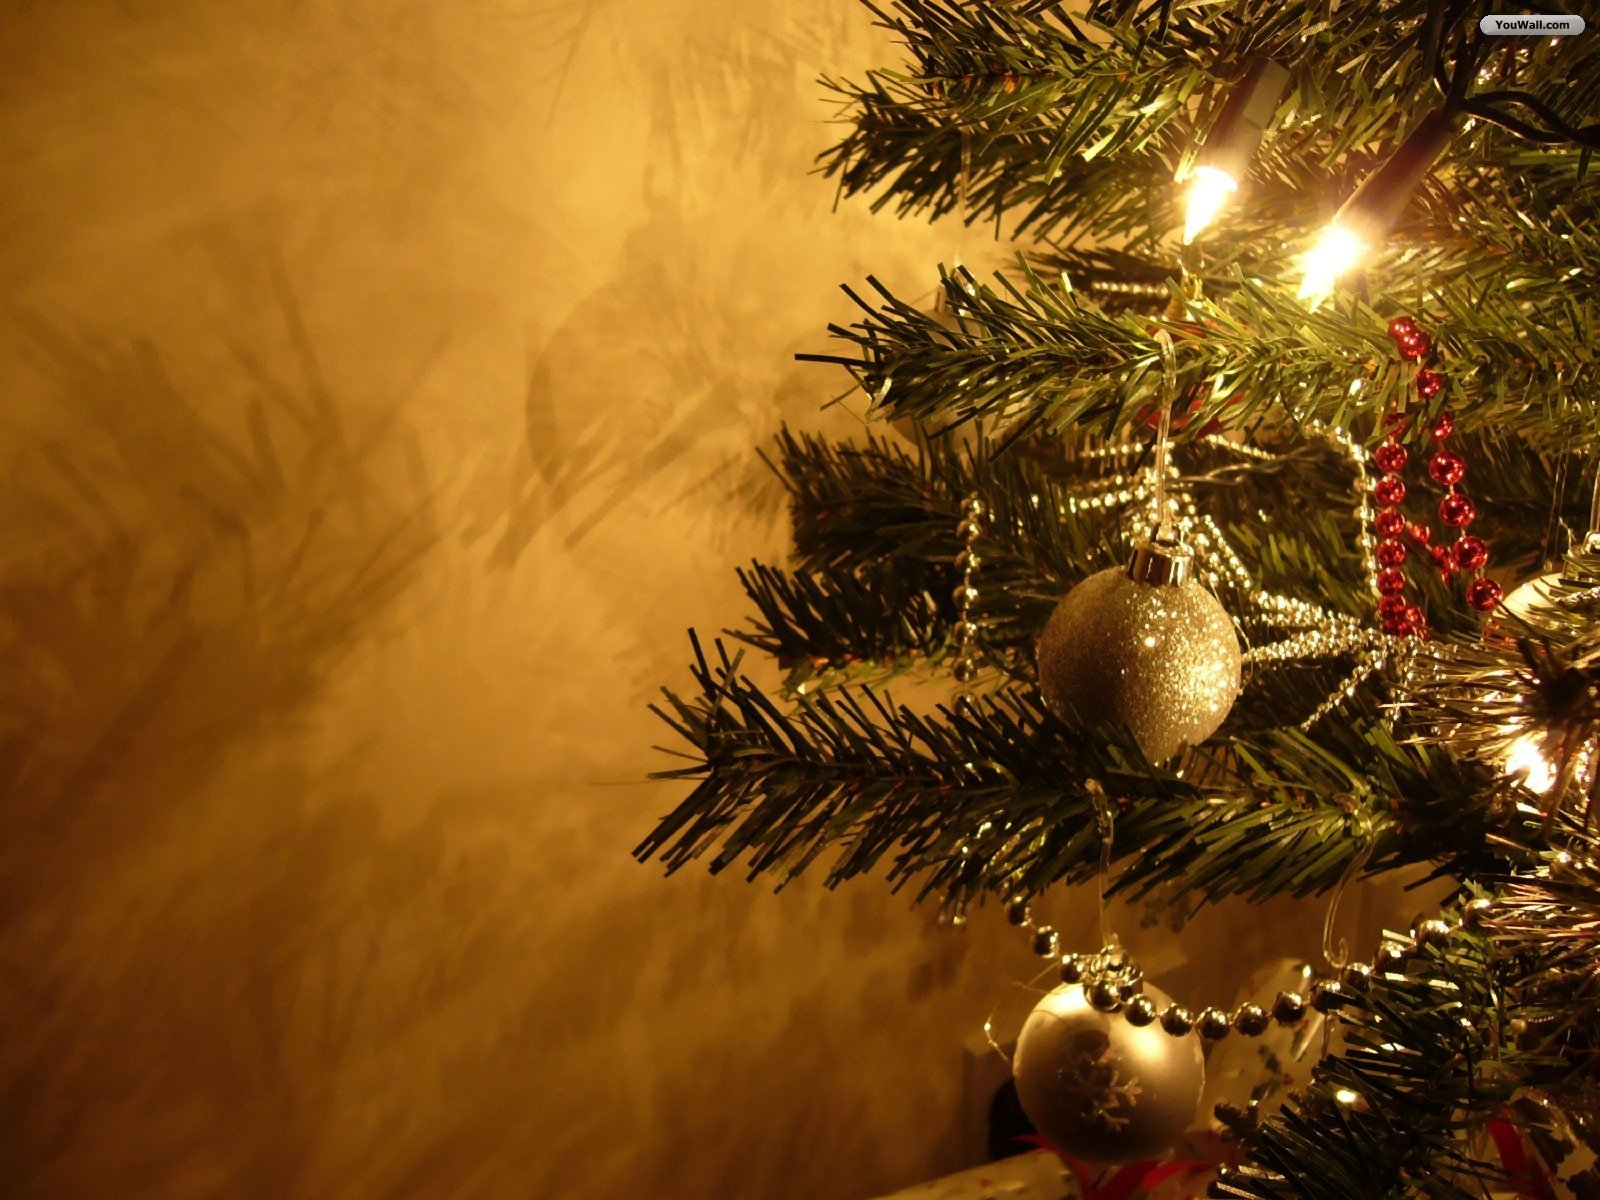 Christmas Tree Wallpapers - wallpaper